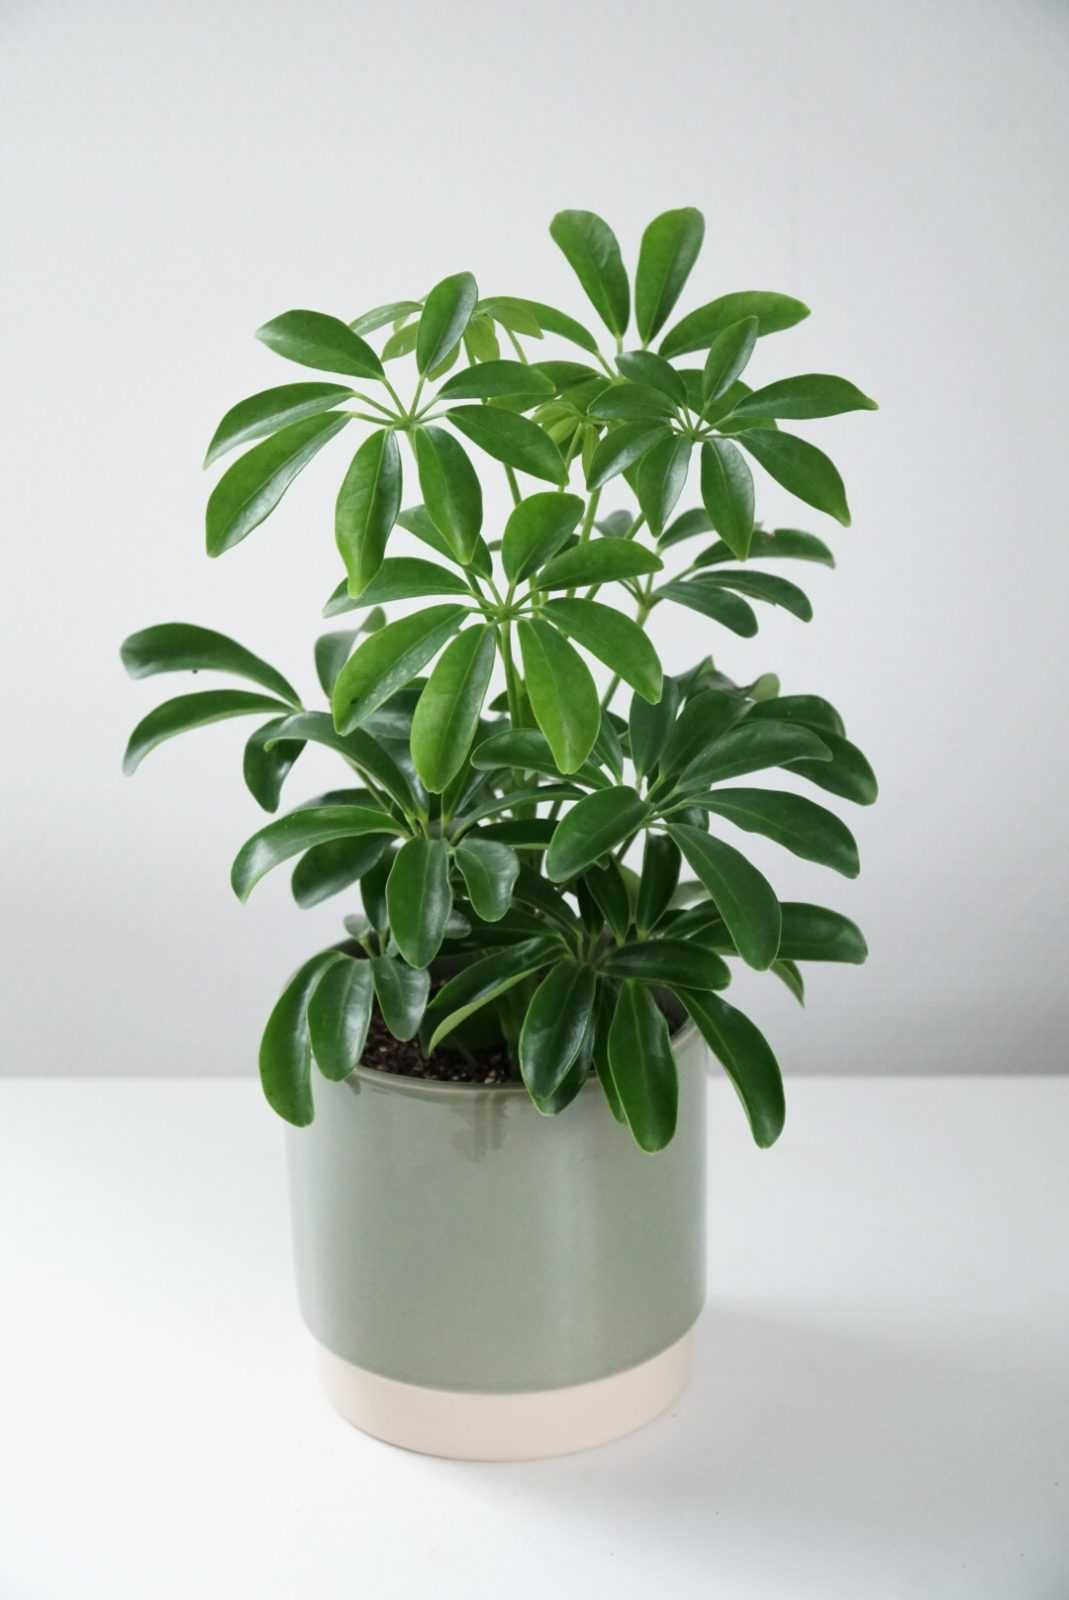 vingerplant vingersplant schefflera plant plantje stek stekje terracotta pot potje glas glaasje rood